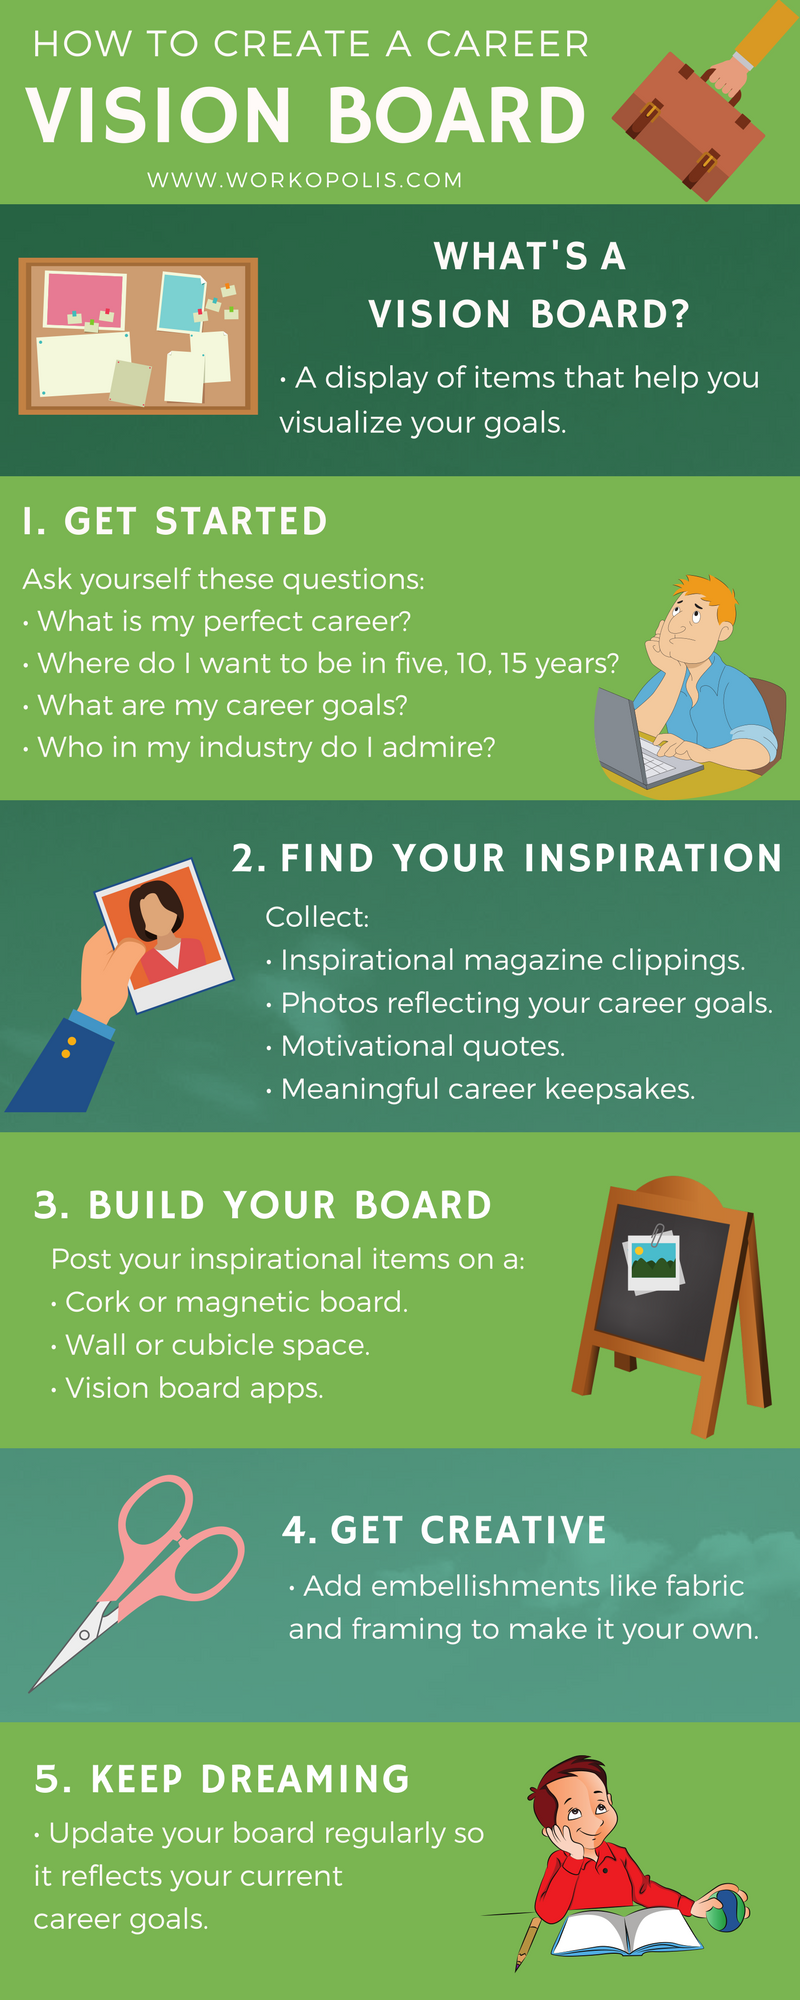 How to make a career 43